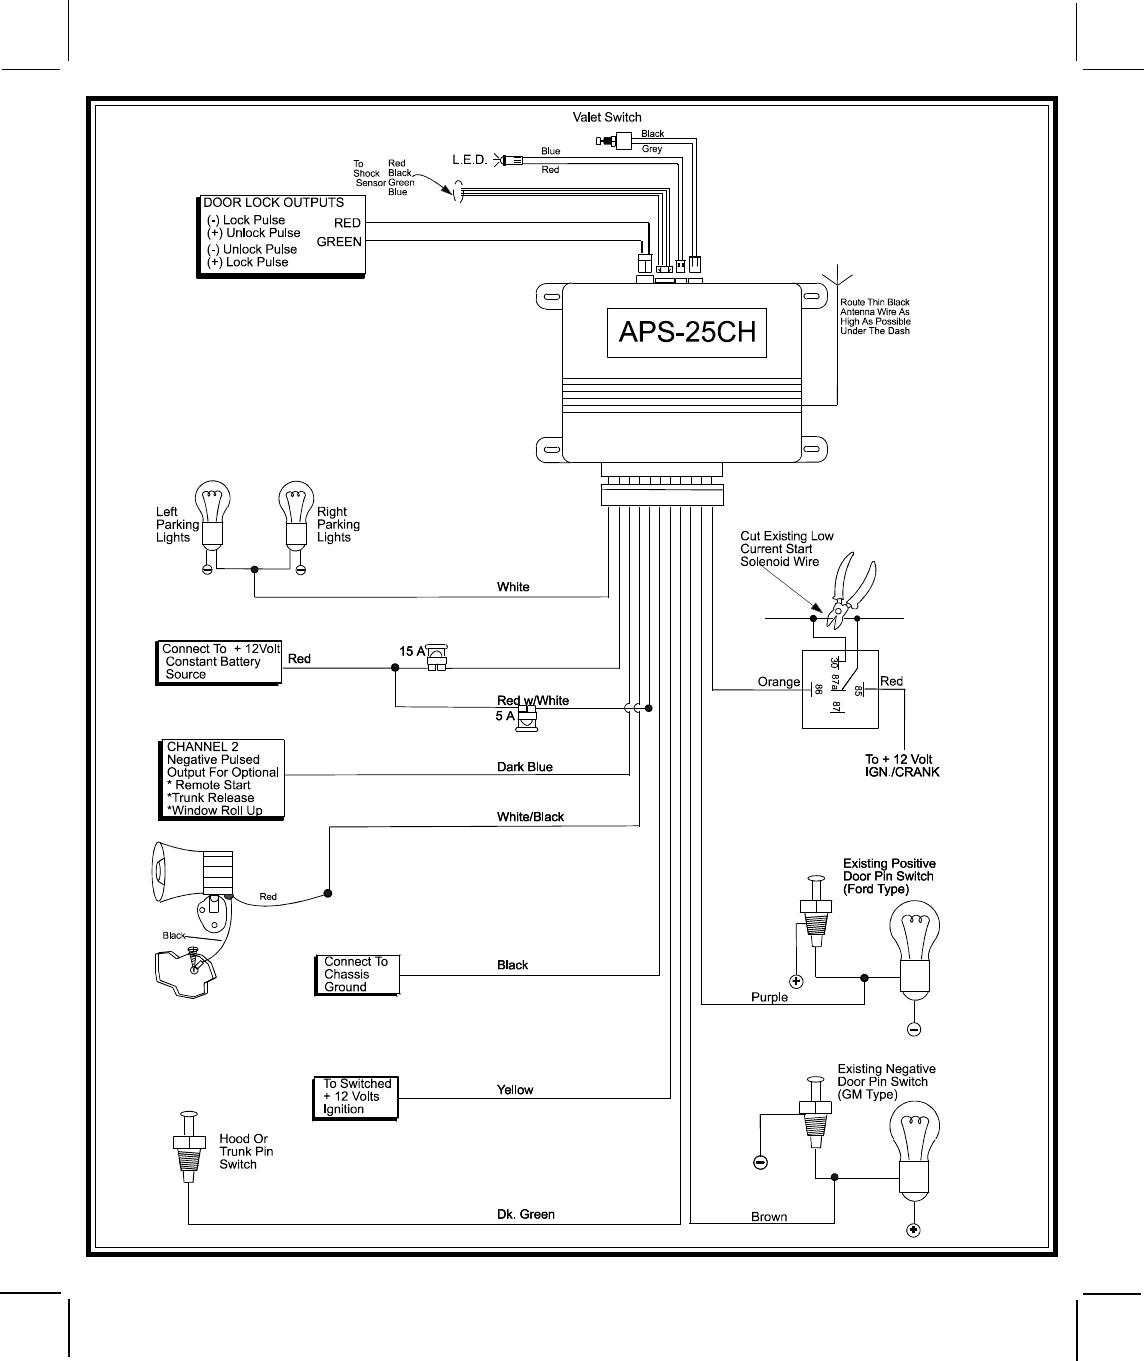 [WLLP_2054]   BZ_9805] Switch Wiring Diagram Together With Security Car Alarm Circuit  Diagram Download Diagram | Imetrik Car Alarm Wiring Diagrams |  | Oupli Weasi Hila Reda Ixtu Onica Dext Cajos Kicep Zidur Opein  Mohammedshrine Librar Wiring 101